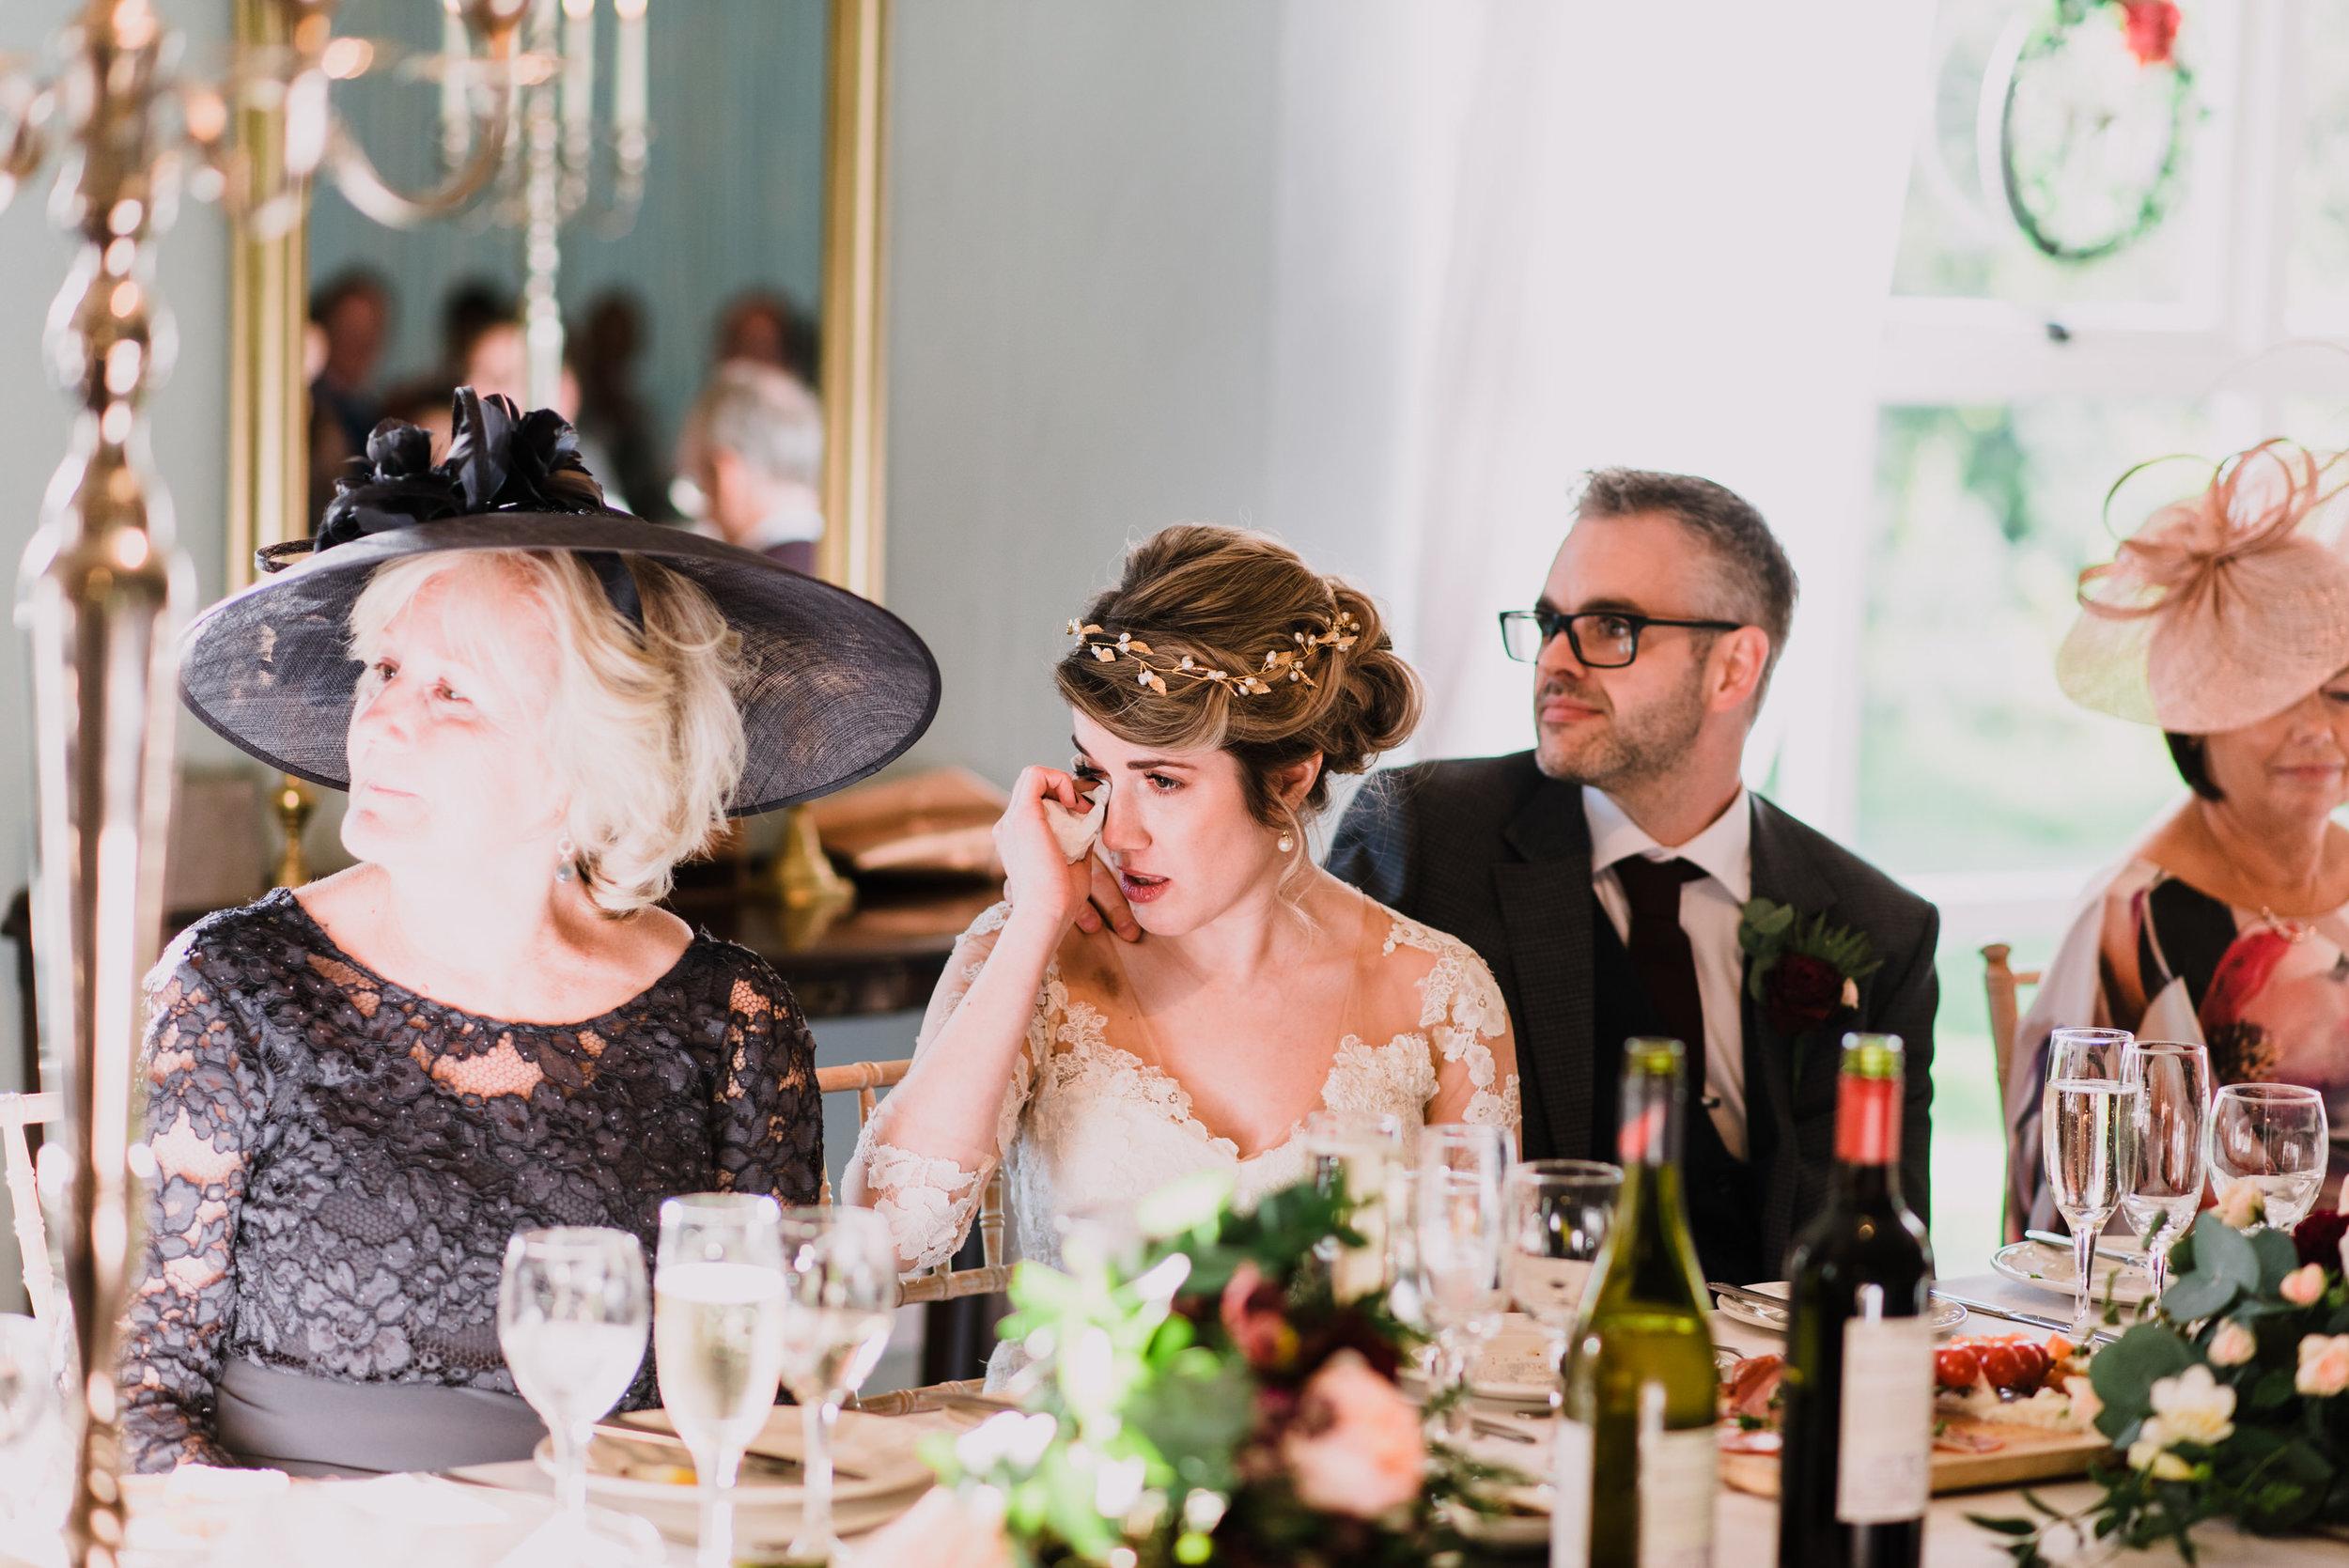 lissanoure castle wedding, northern ireland wedding photographer, romantic northern irish wedding venue, castle wedding ireland, natural wedding photography ni (107).jpg